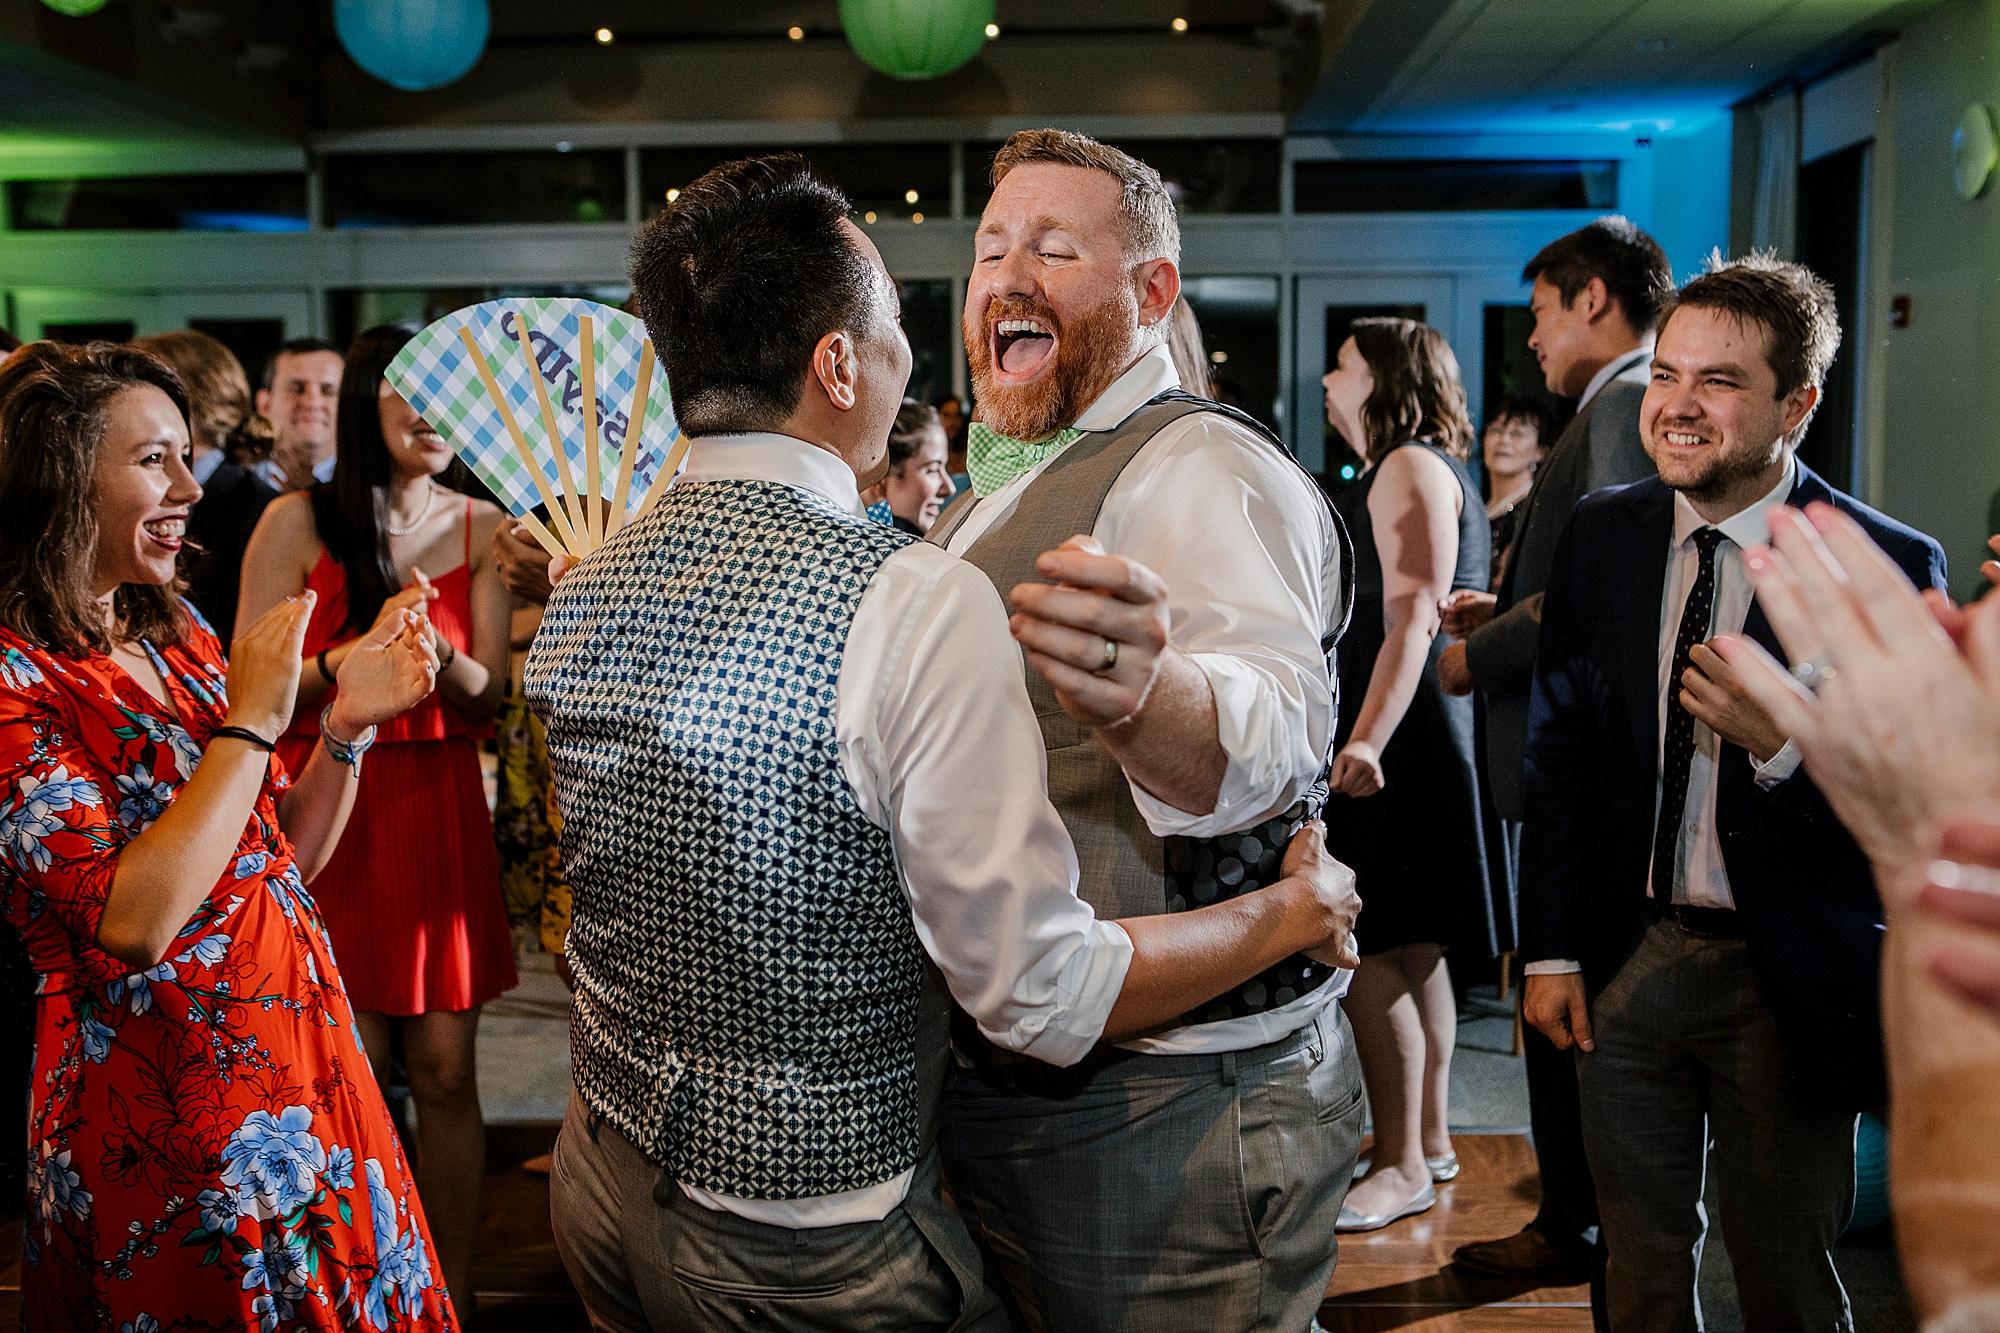 Dan_and_Byron_Love_by_Joe_Mac_Philadelphia_Wedding_LGBTQ_Photography_Gay_Independence_visitor_Center_140.JPG